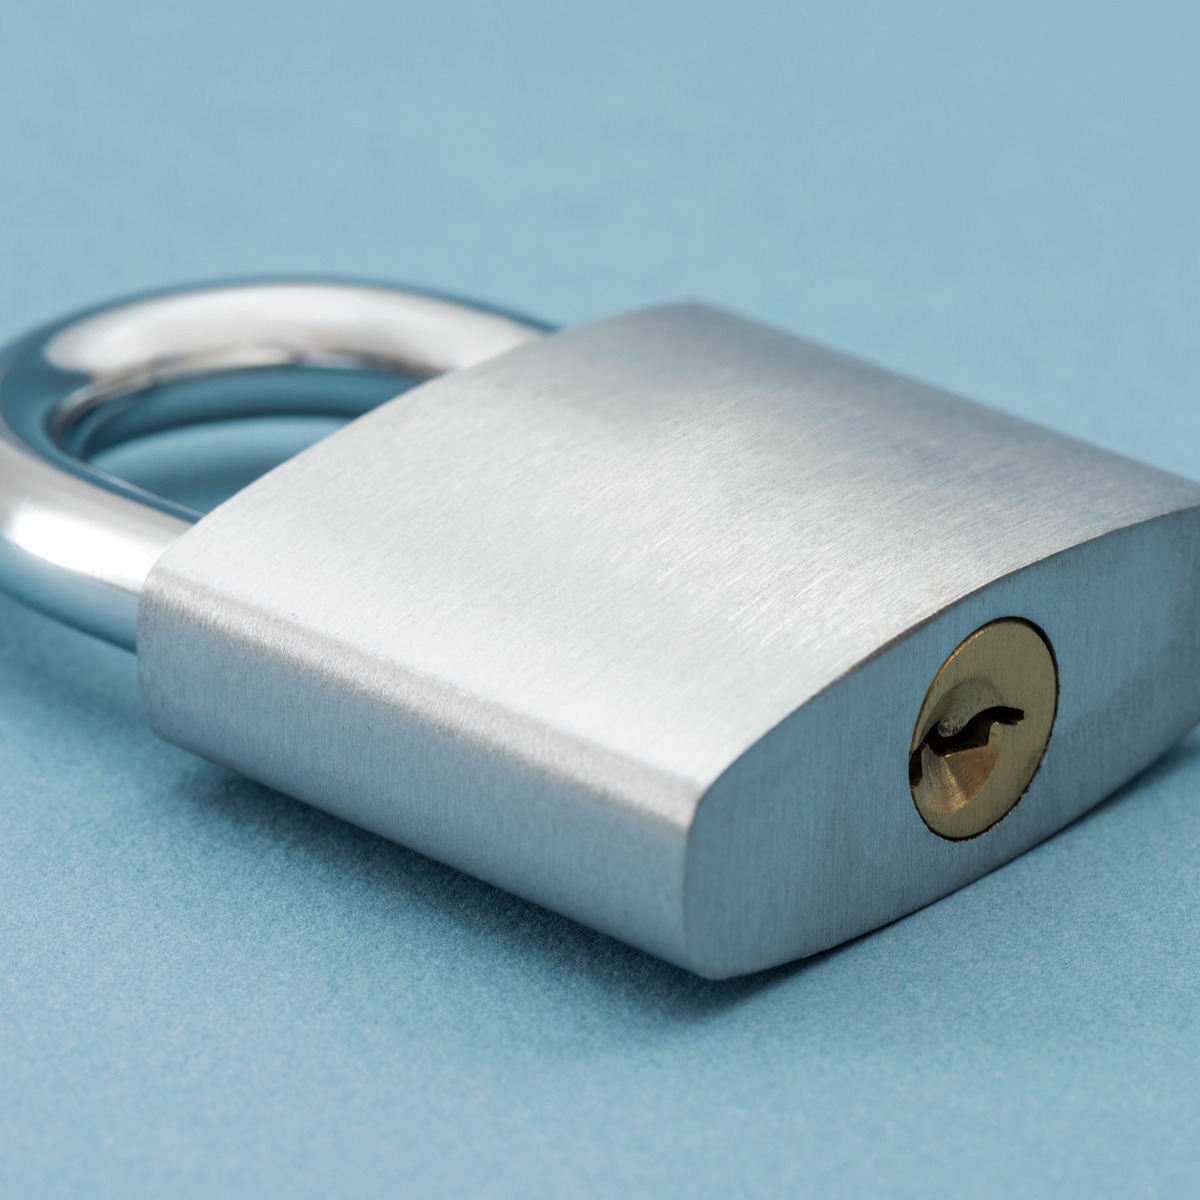 haveuheard lock